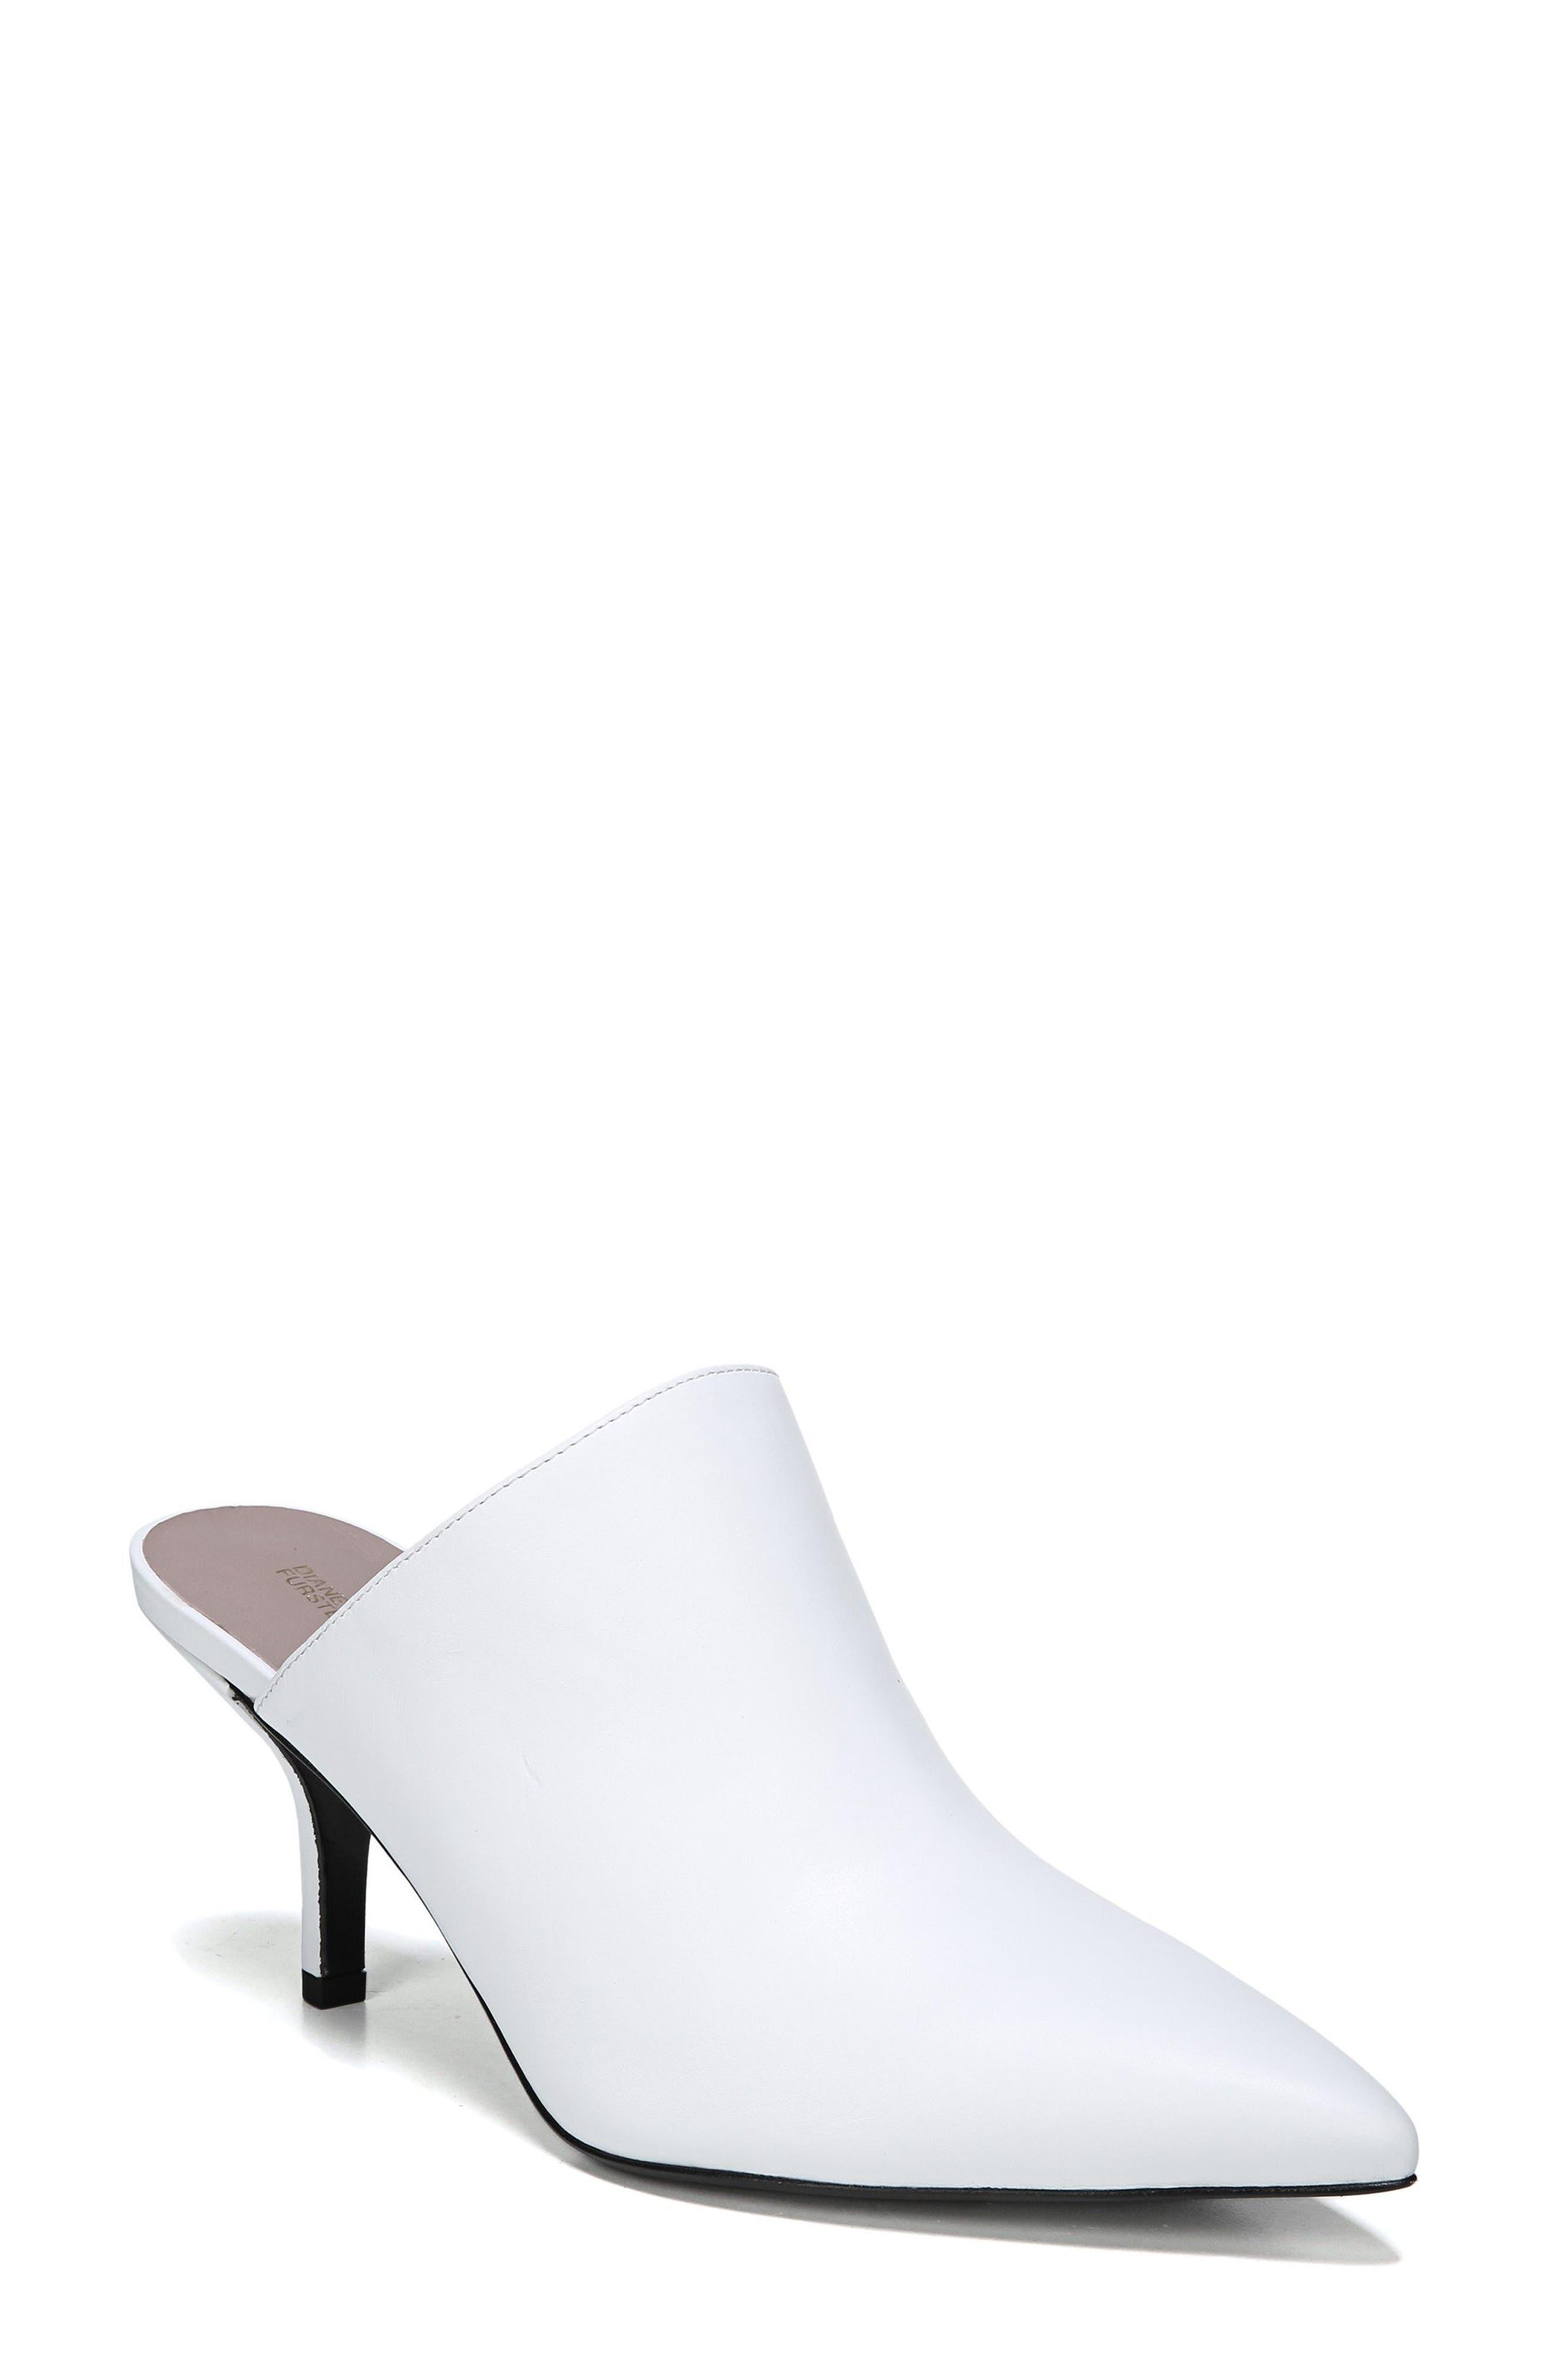 Alternate Image 1 Selected - Diane von Furstenberg Mikaila Pointy Toe Mule (Women)